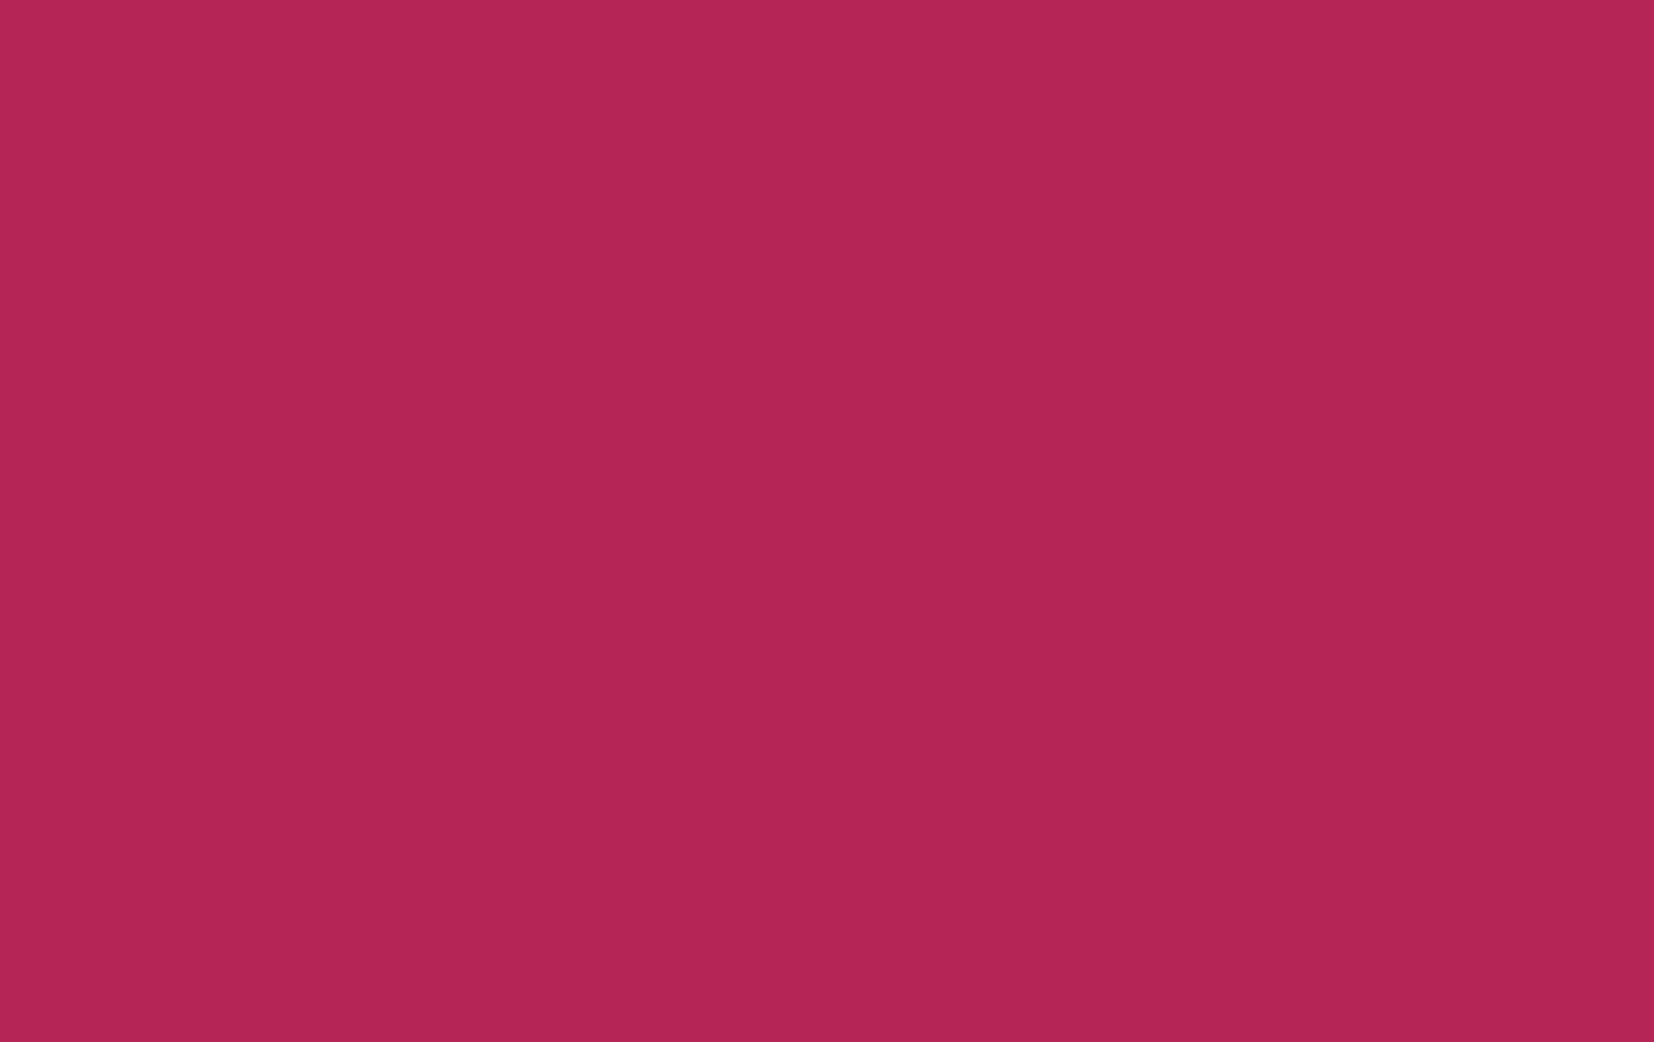 Bright Pink Vertical Blinds Cheapest Blinds Uk Ltd